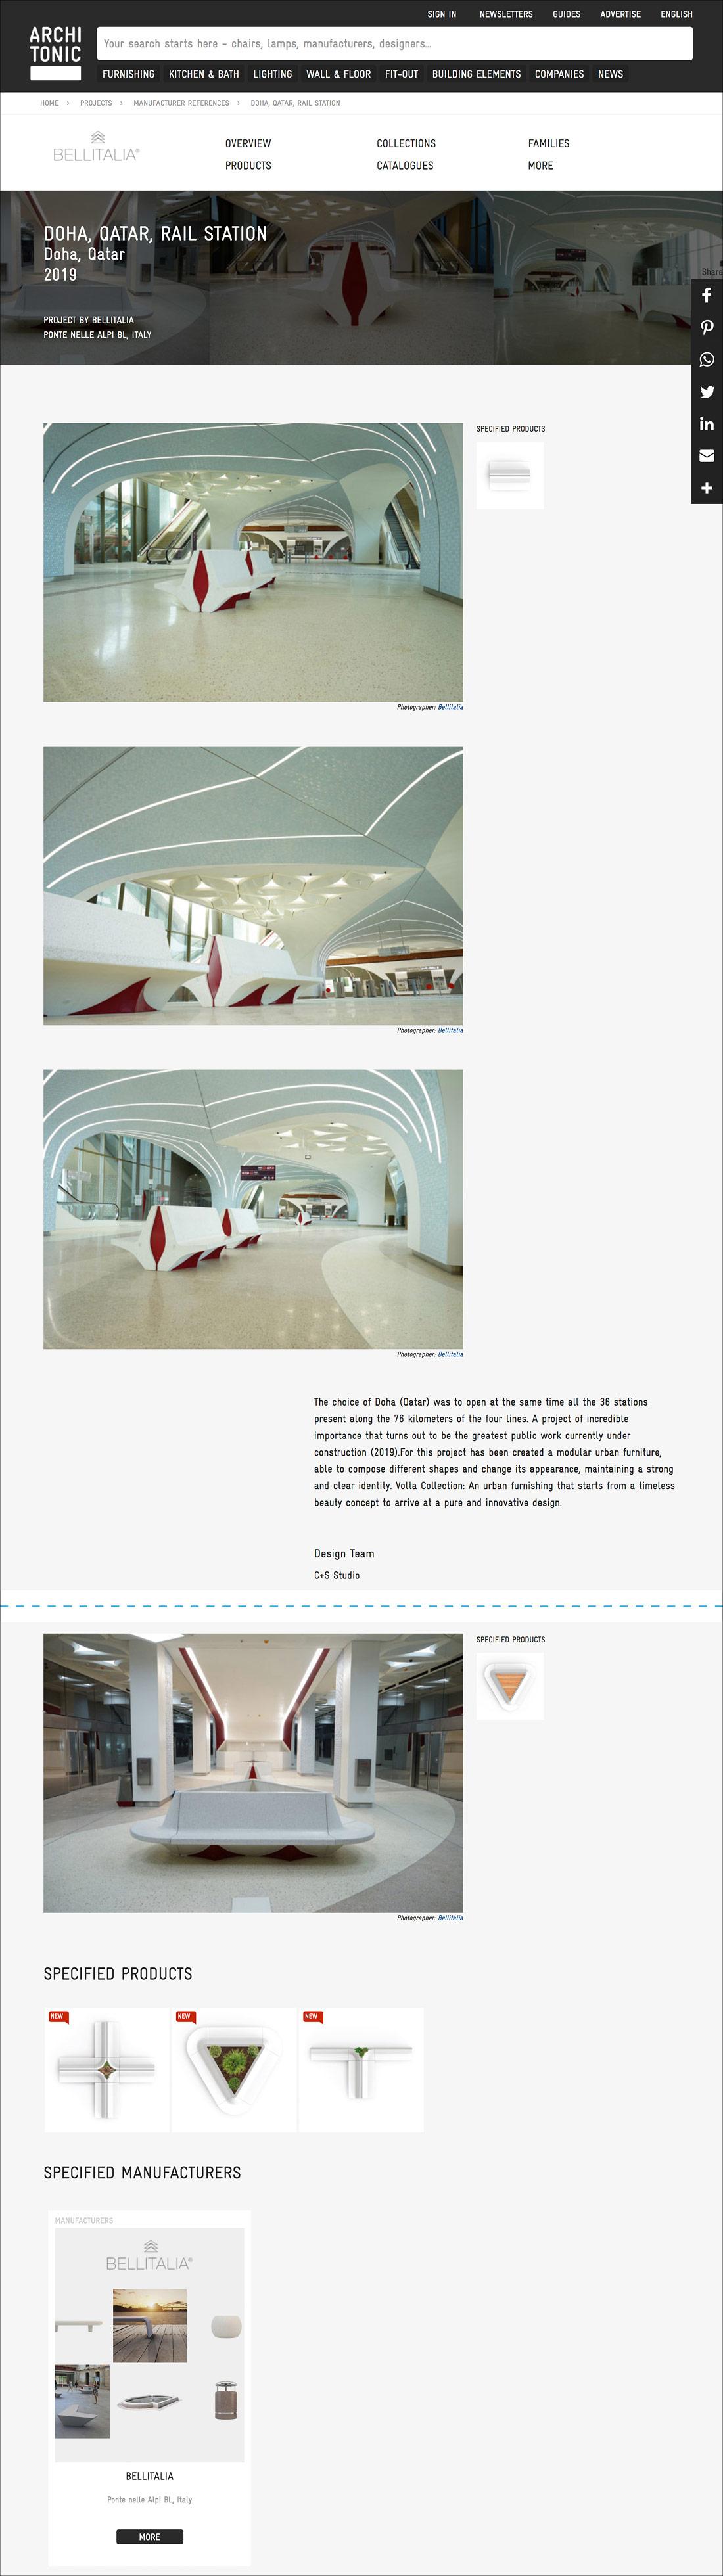 project-post_bellitalia_doha-rail-station.jpg